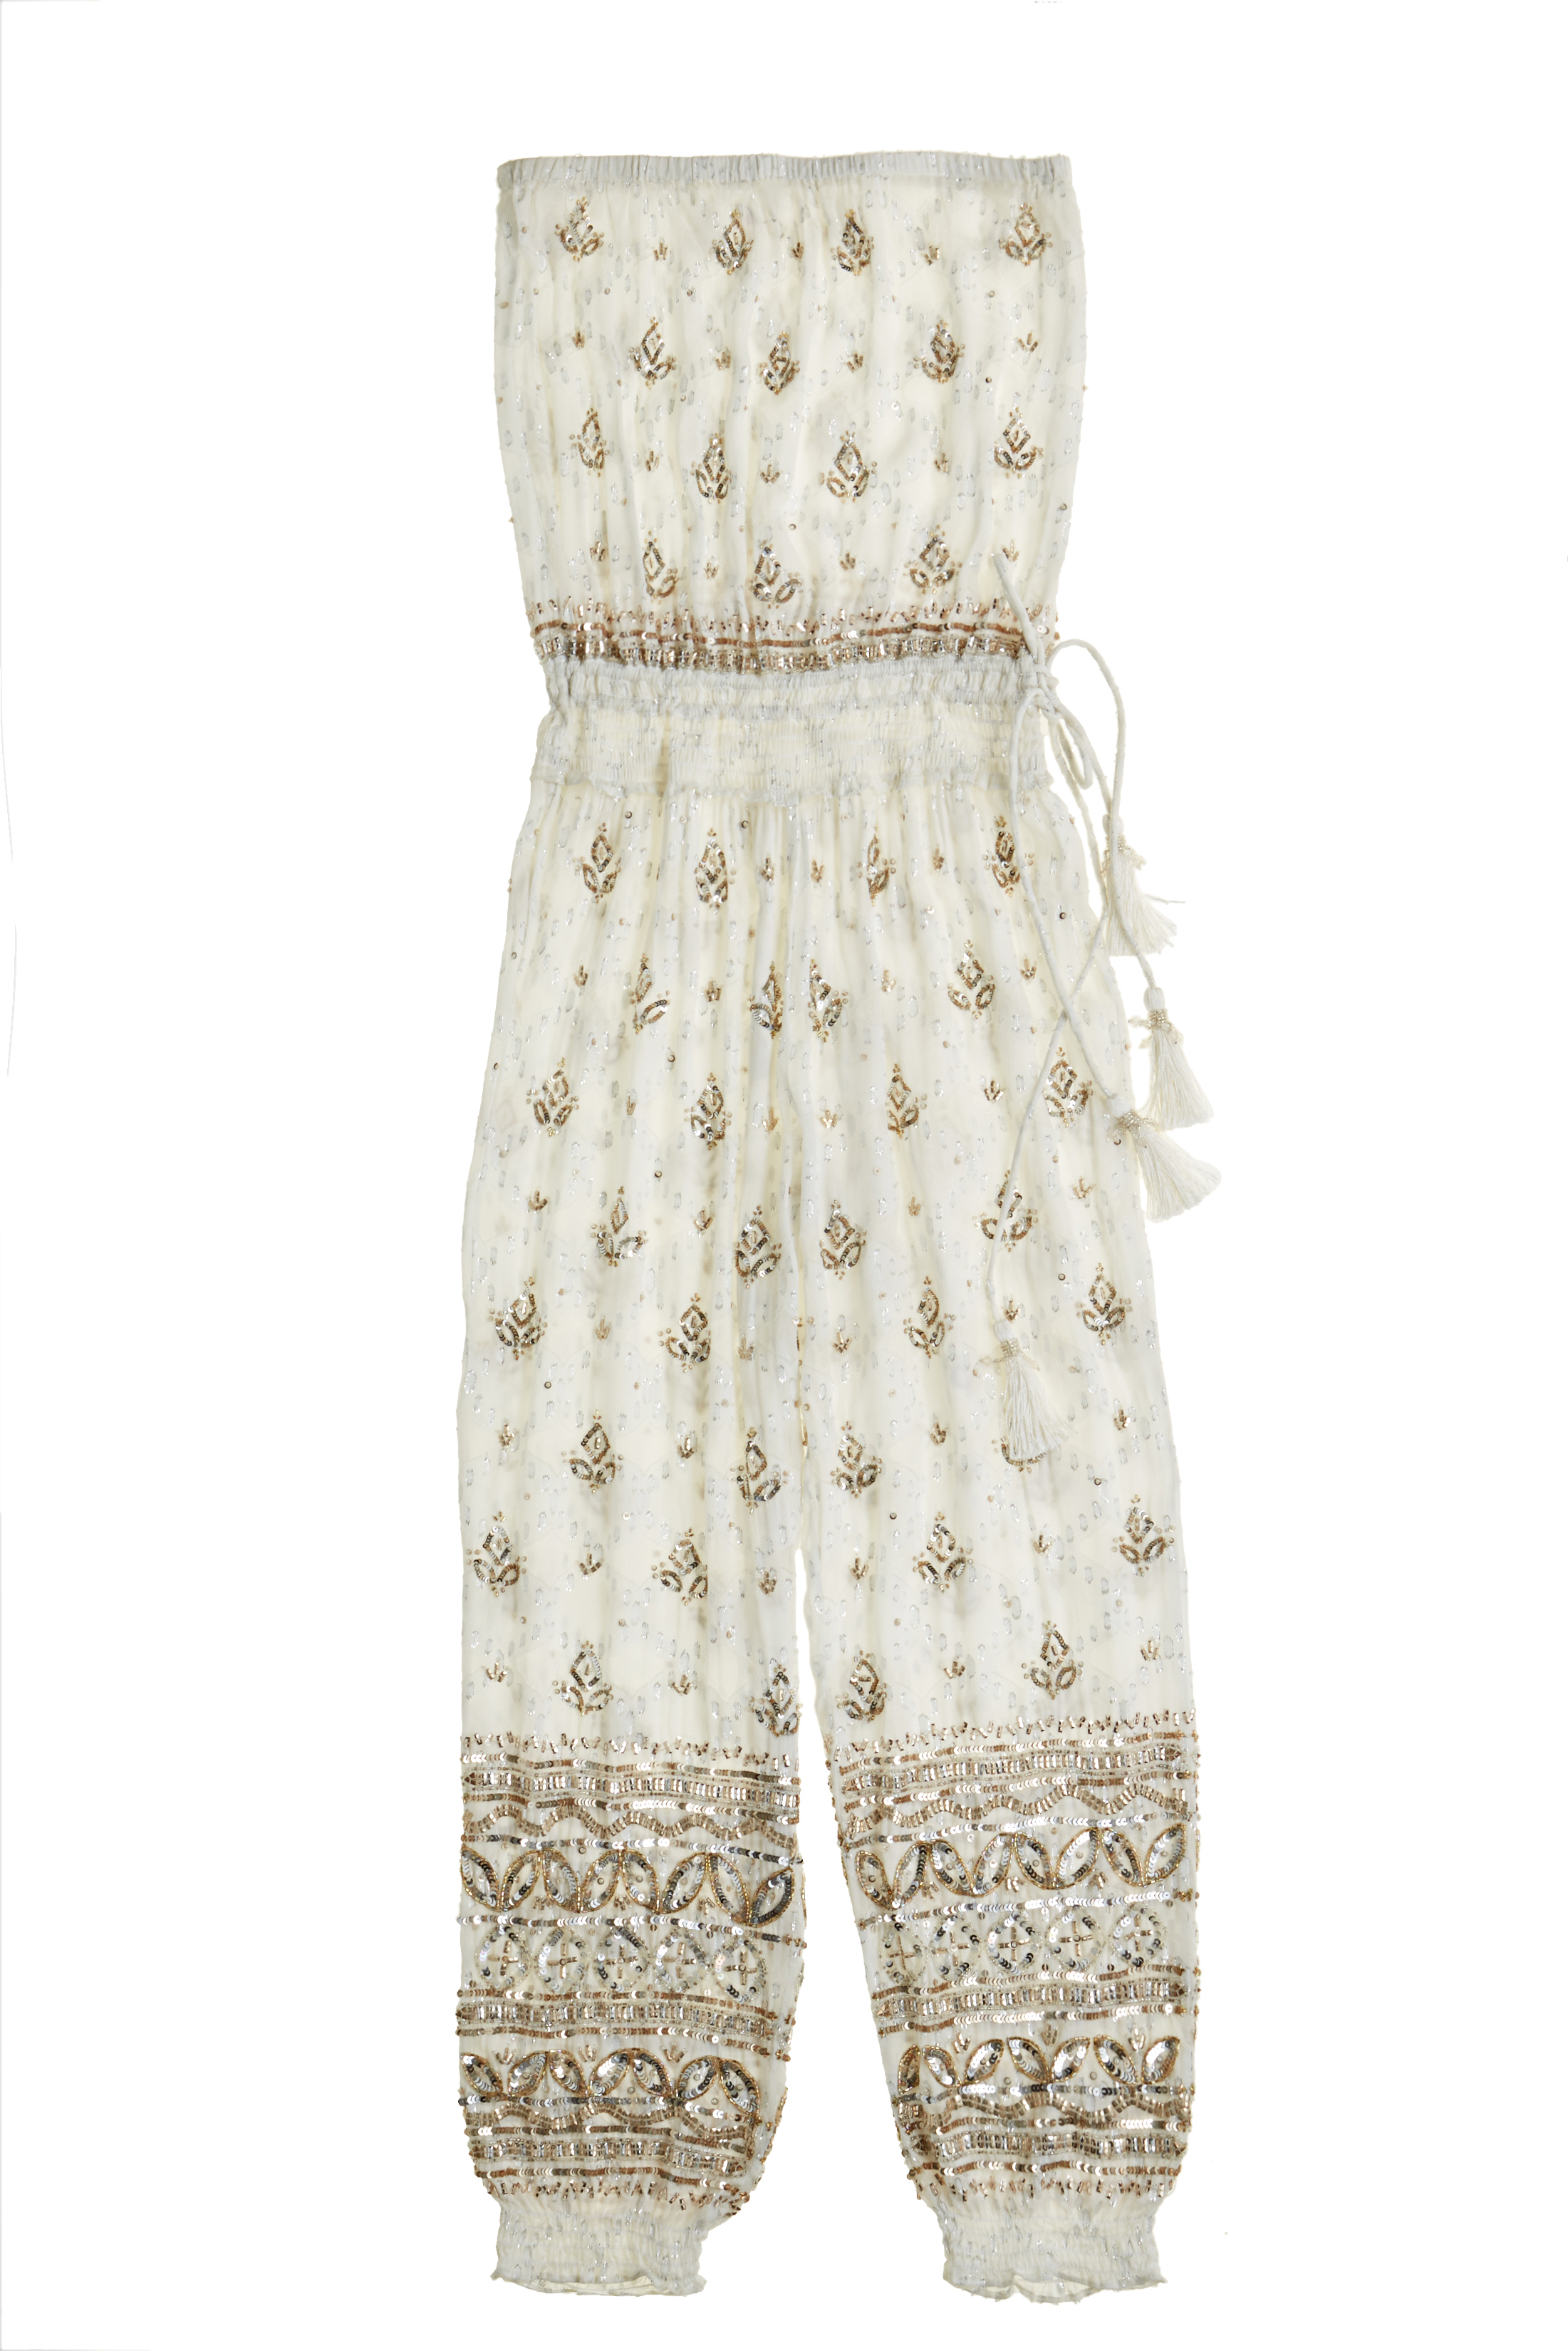 calypso-st-barth-bridal-jovet-jumpsuit-0315.jpg